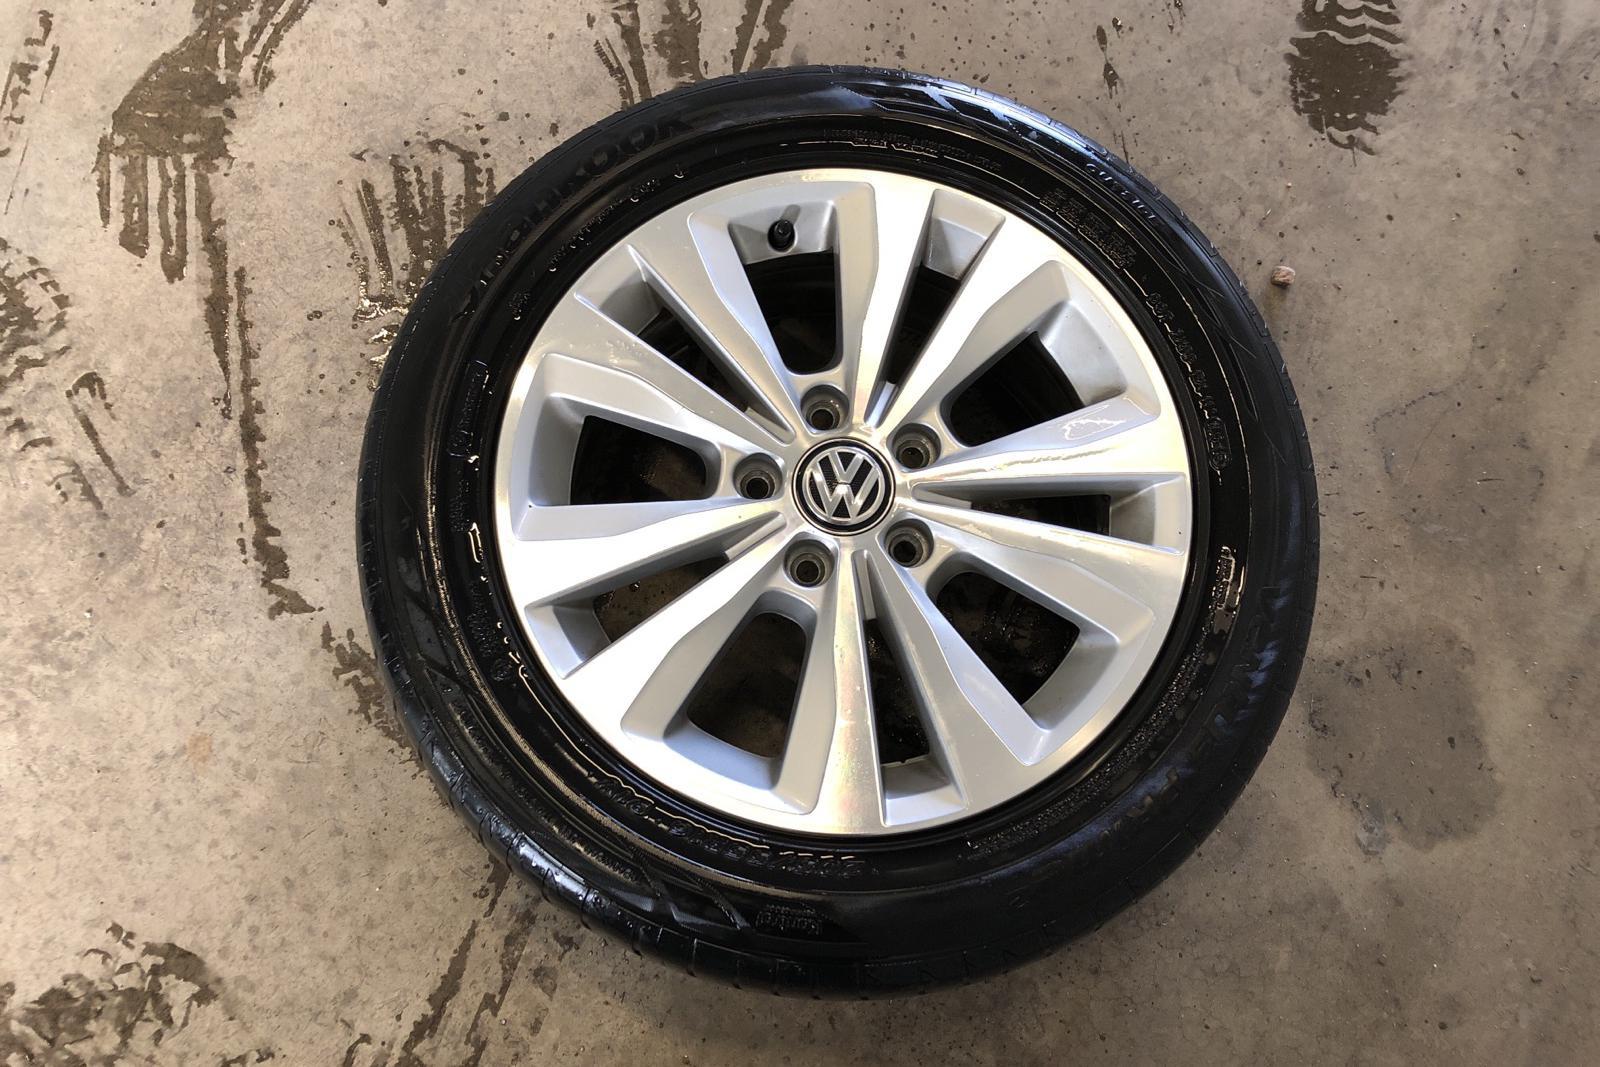 VW Golf VII 1.2 TSI 5dr (110hk) - 8 768 mil - Manuell - svart - 2016